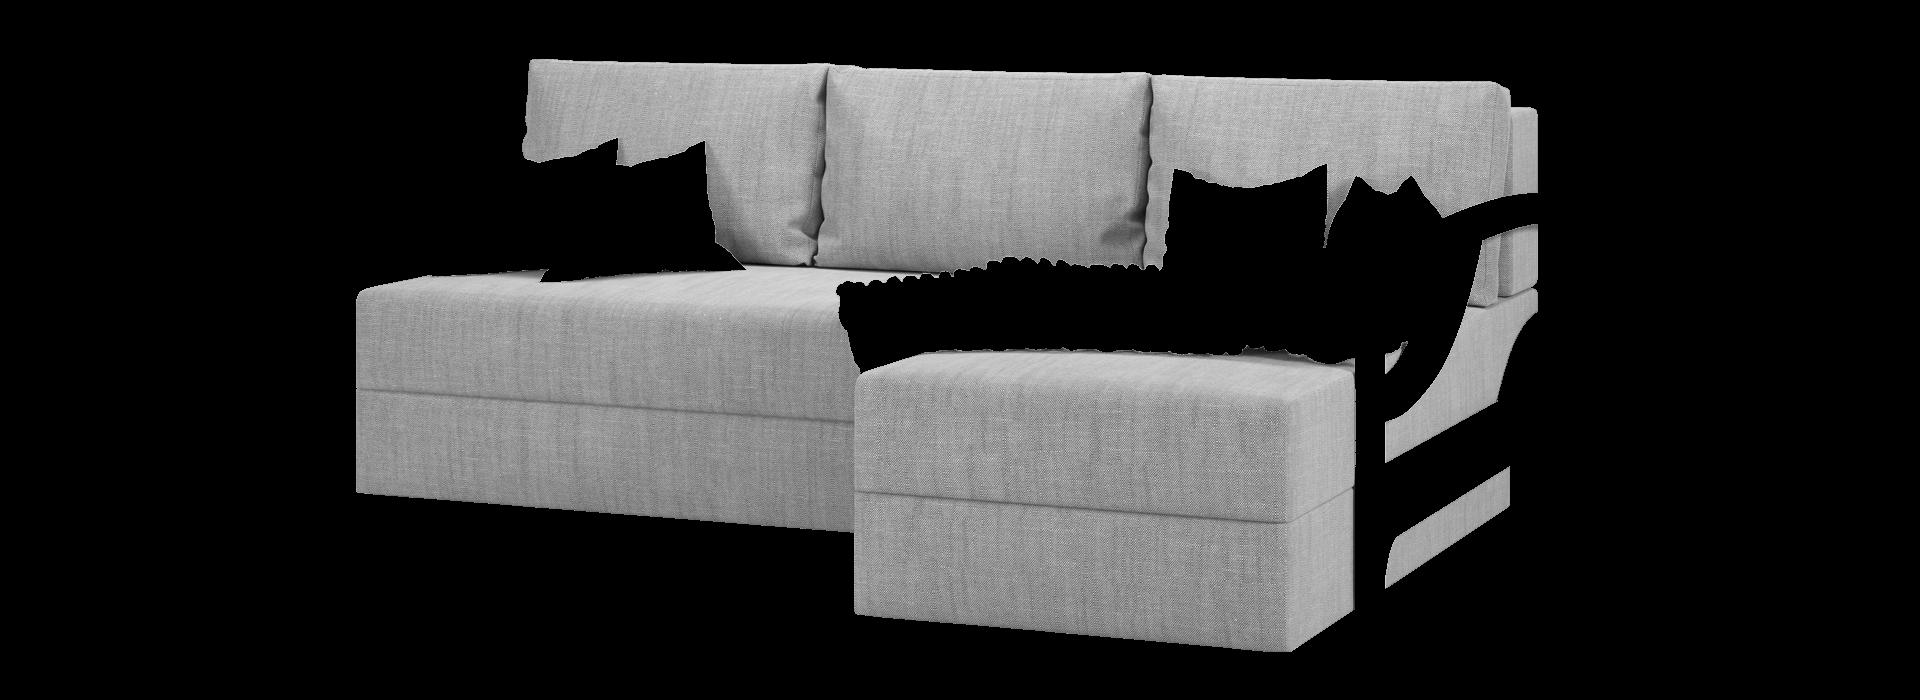 Тамми-4 угловой диван - маска 2